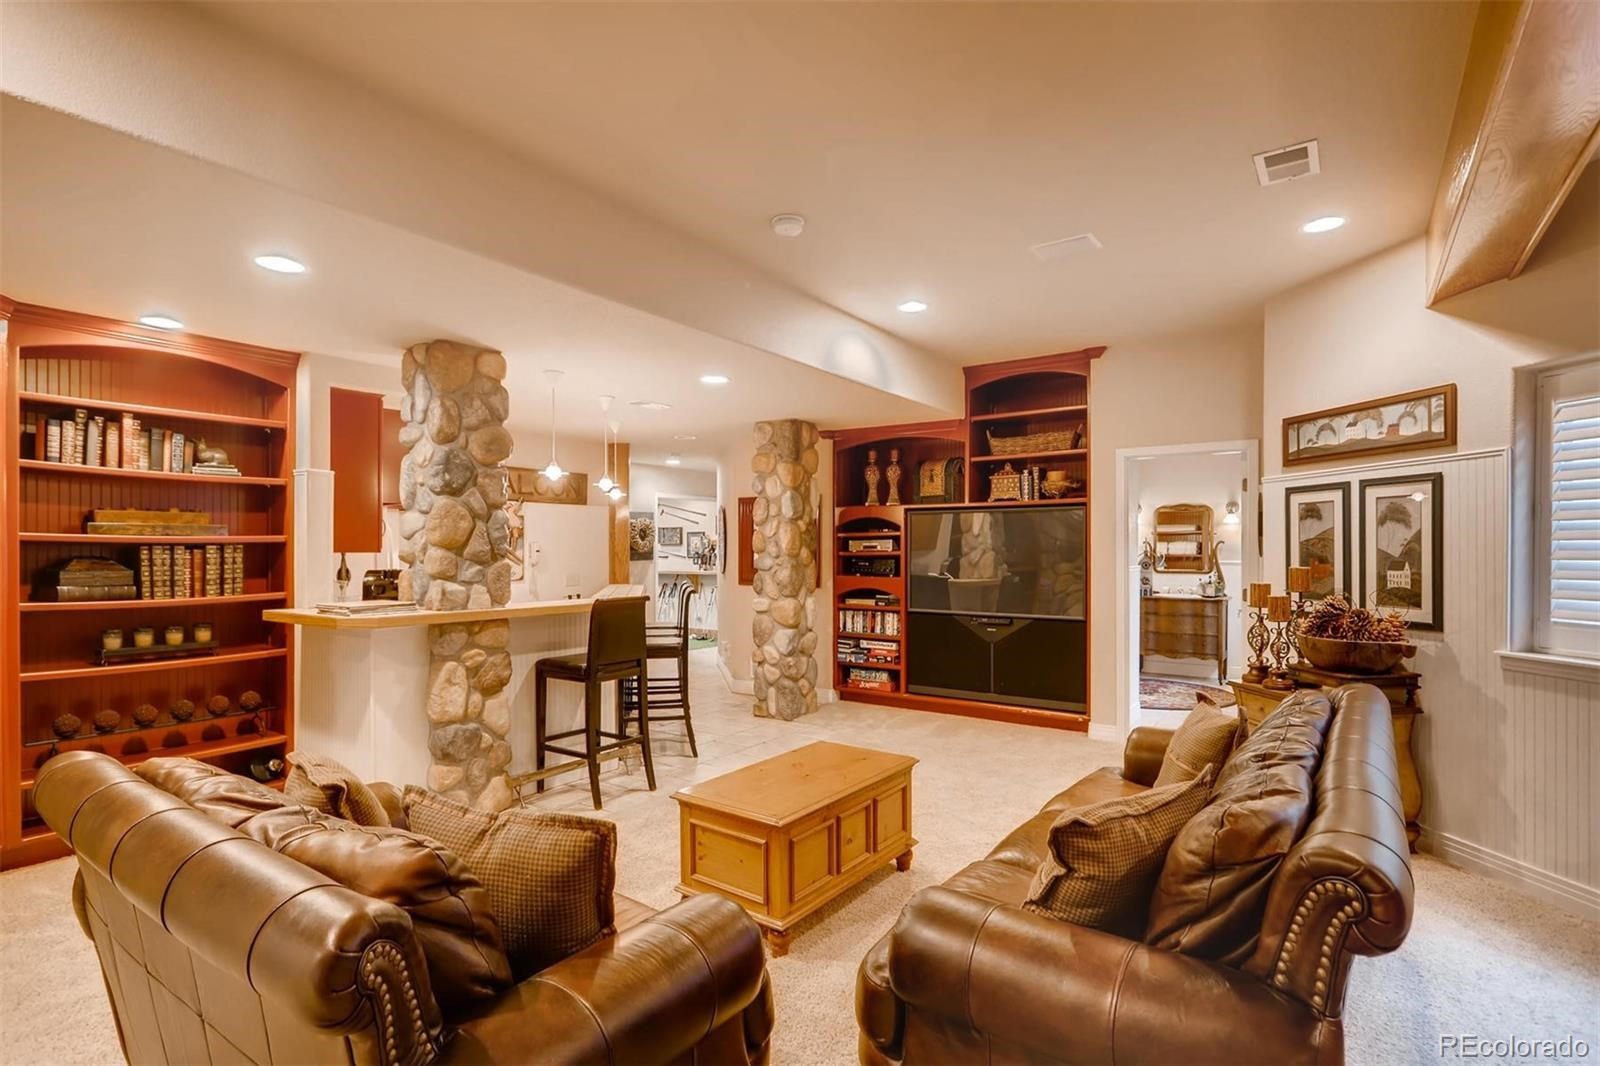 MLS# 5339138 - 16 - 8924 Prairie Knoll Drive, Longmont, CO 80503